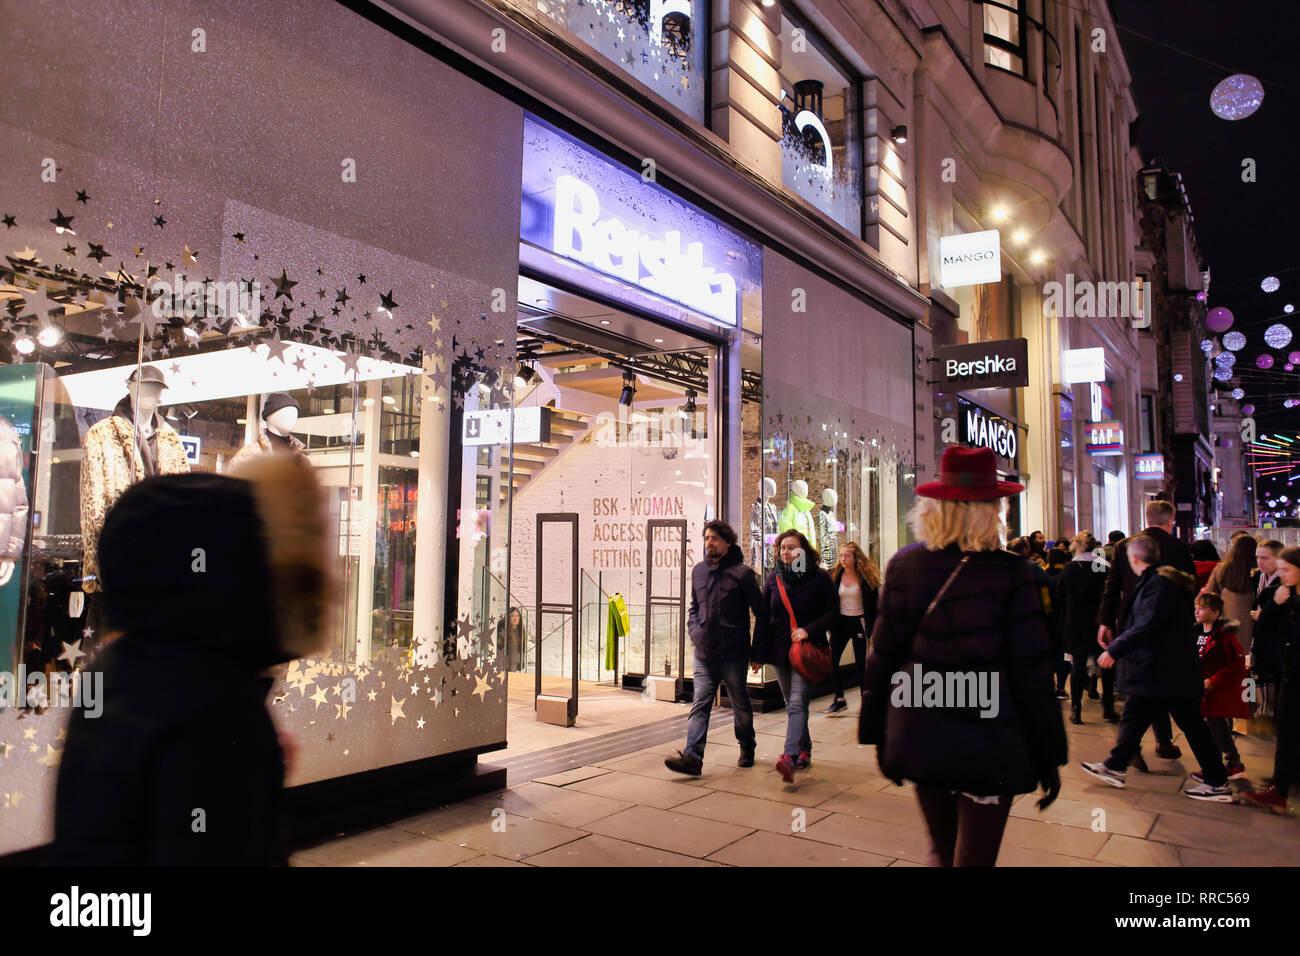 40cc8665 Bershka store on Oxford Street, London, England, UK - Stock Image